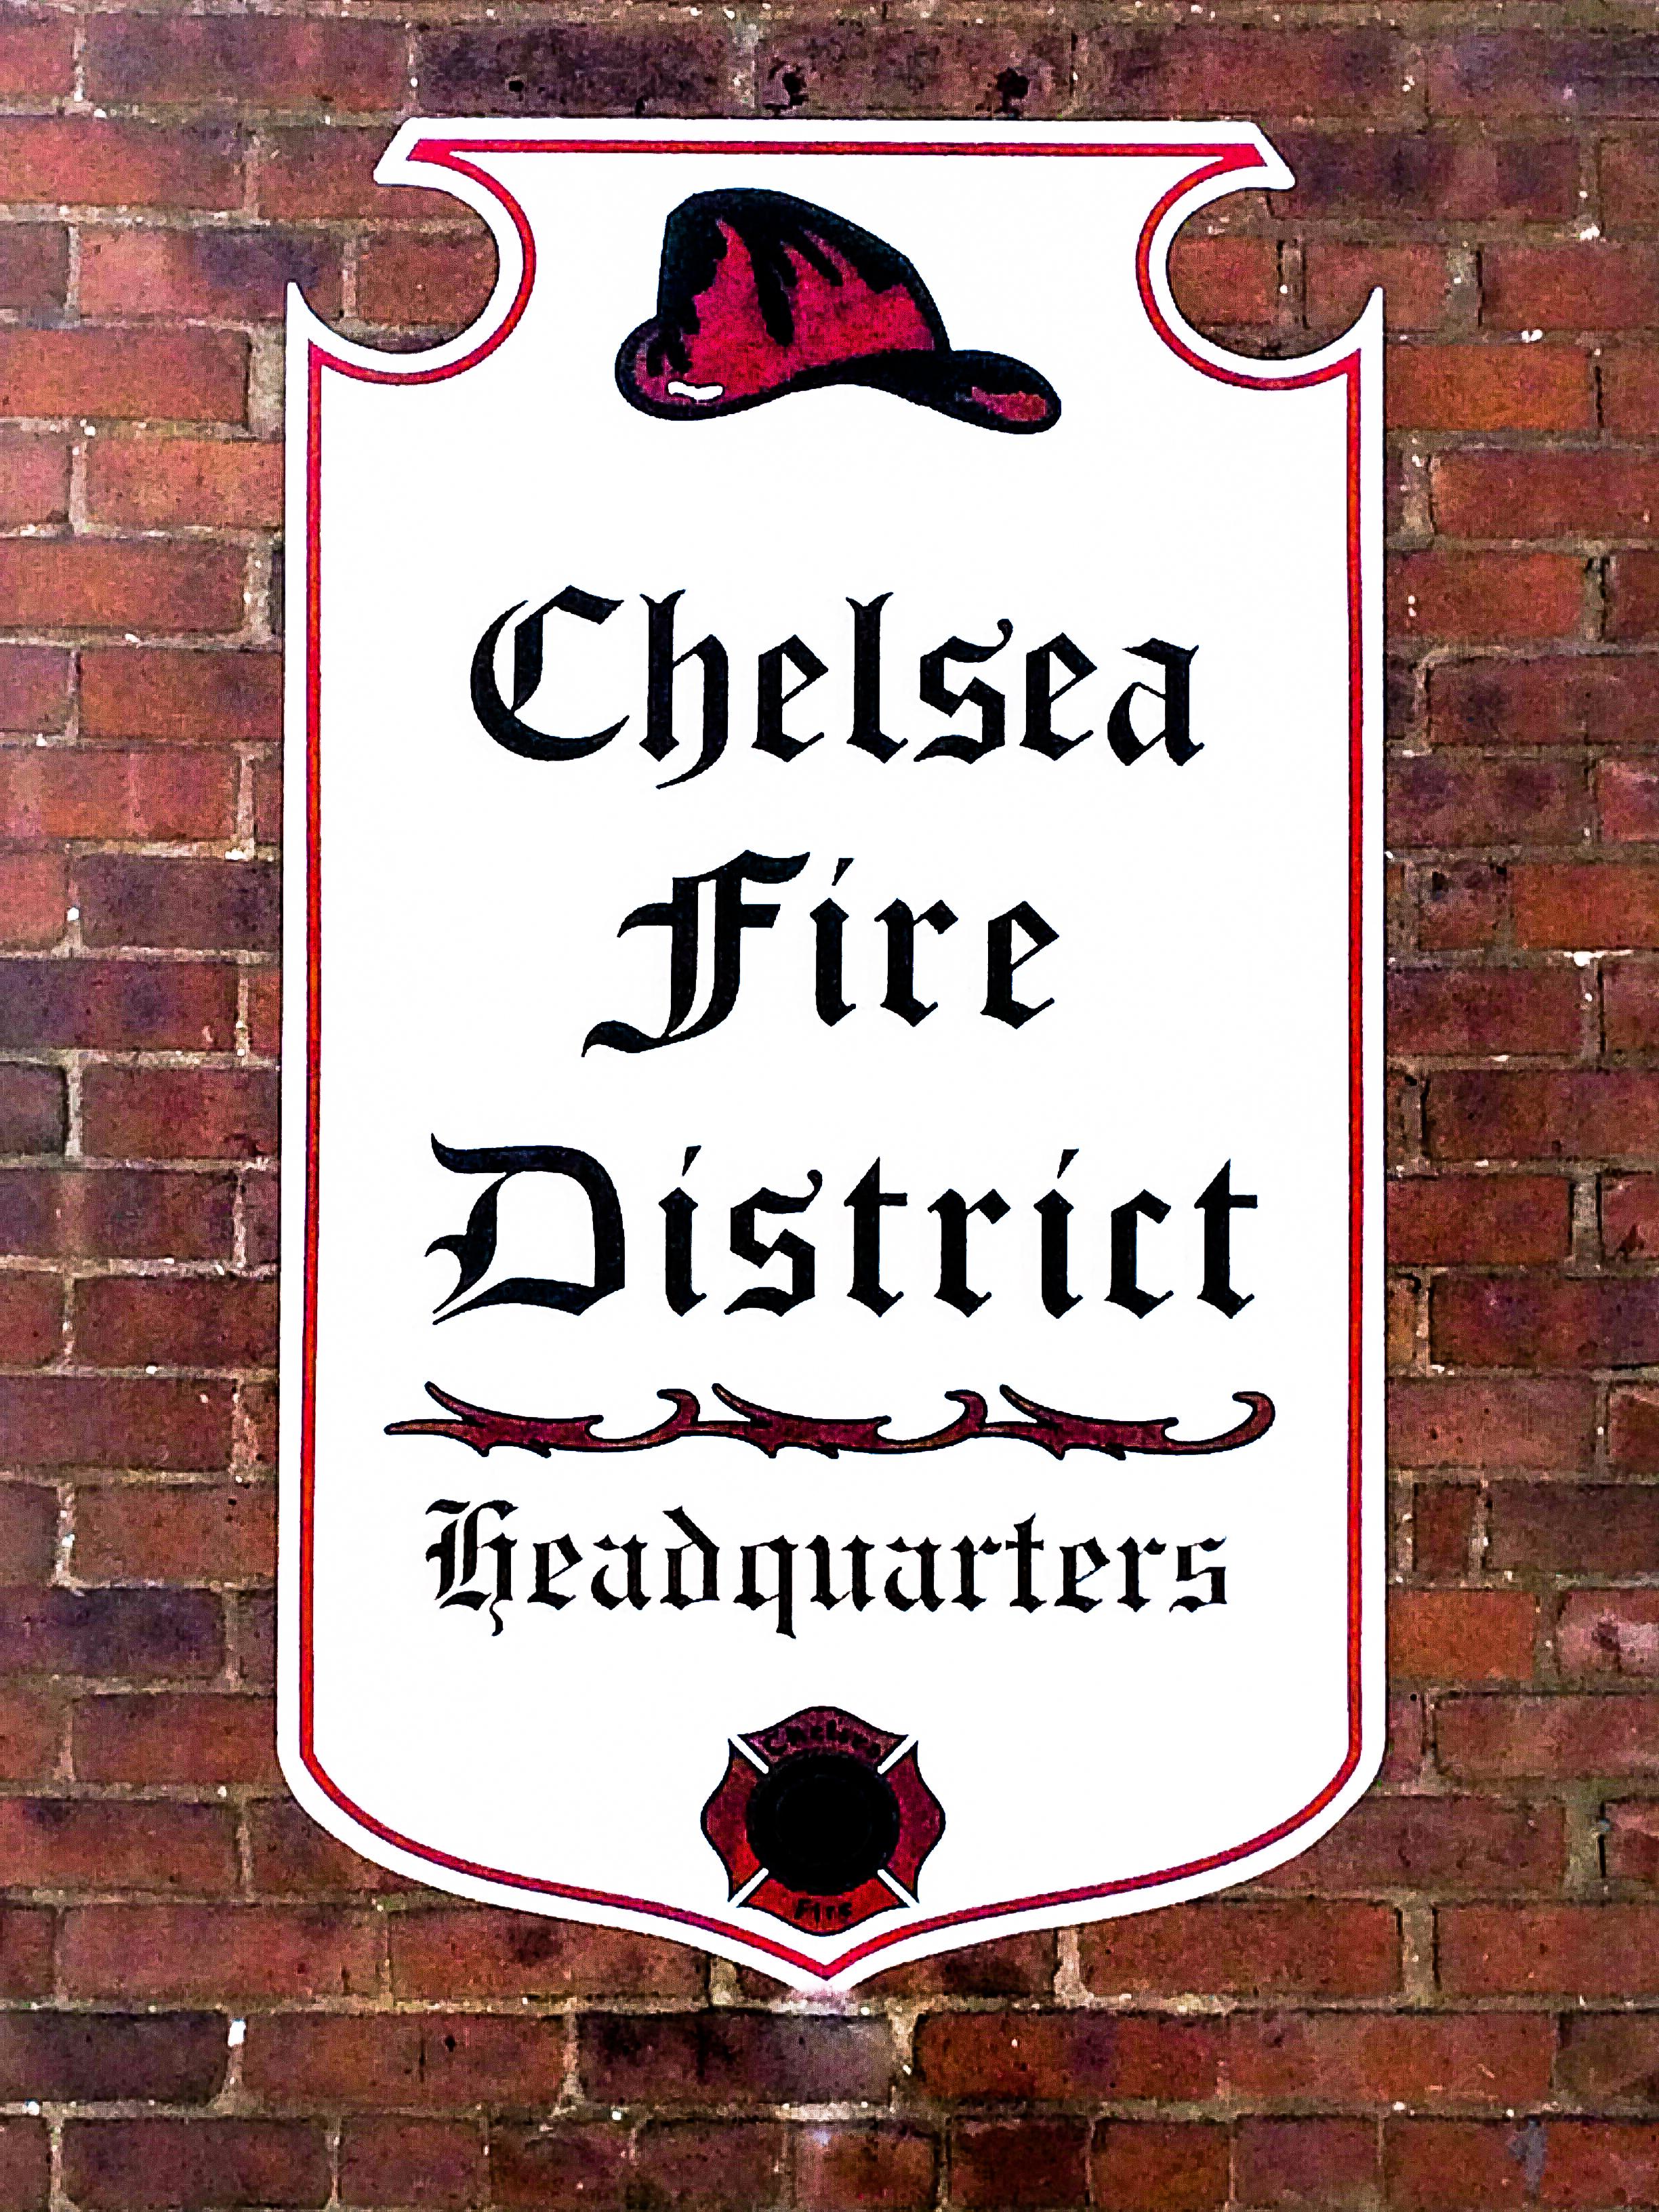 chelsea HQ plaque.jpg